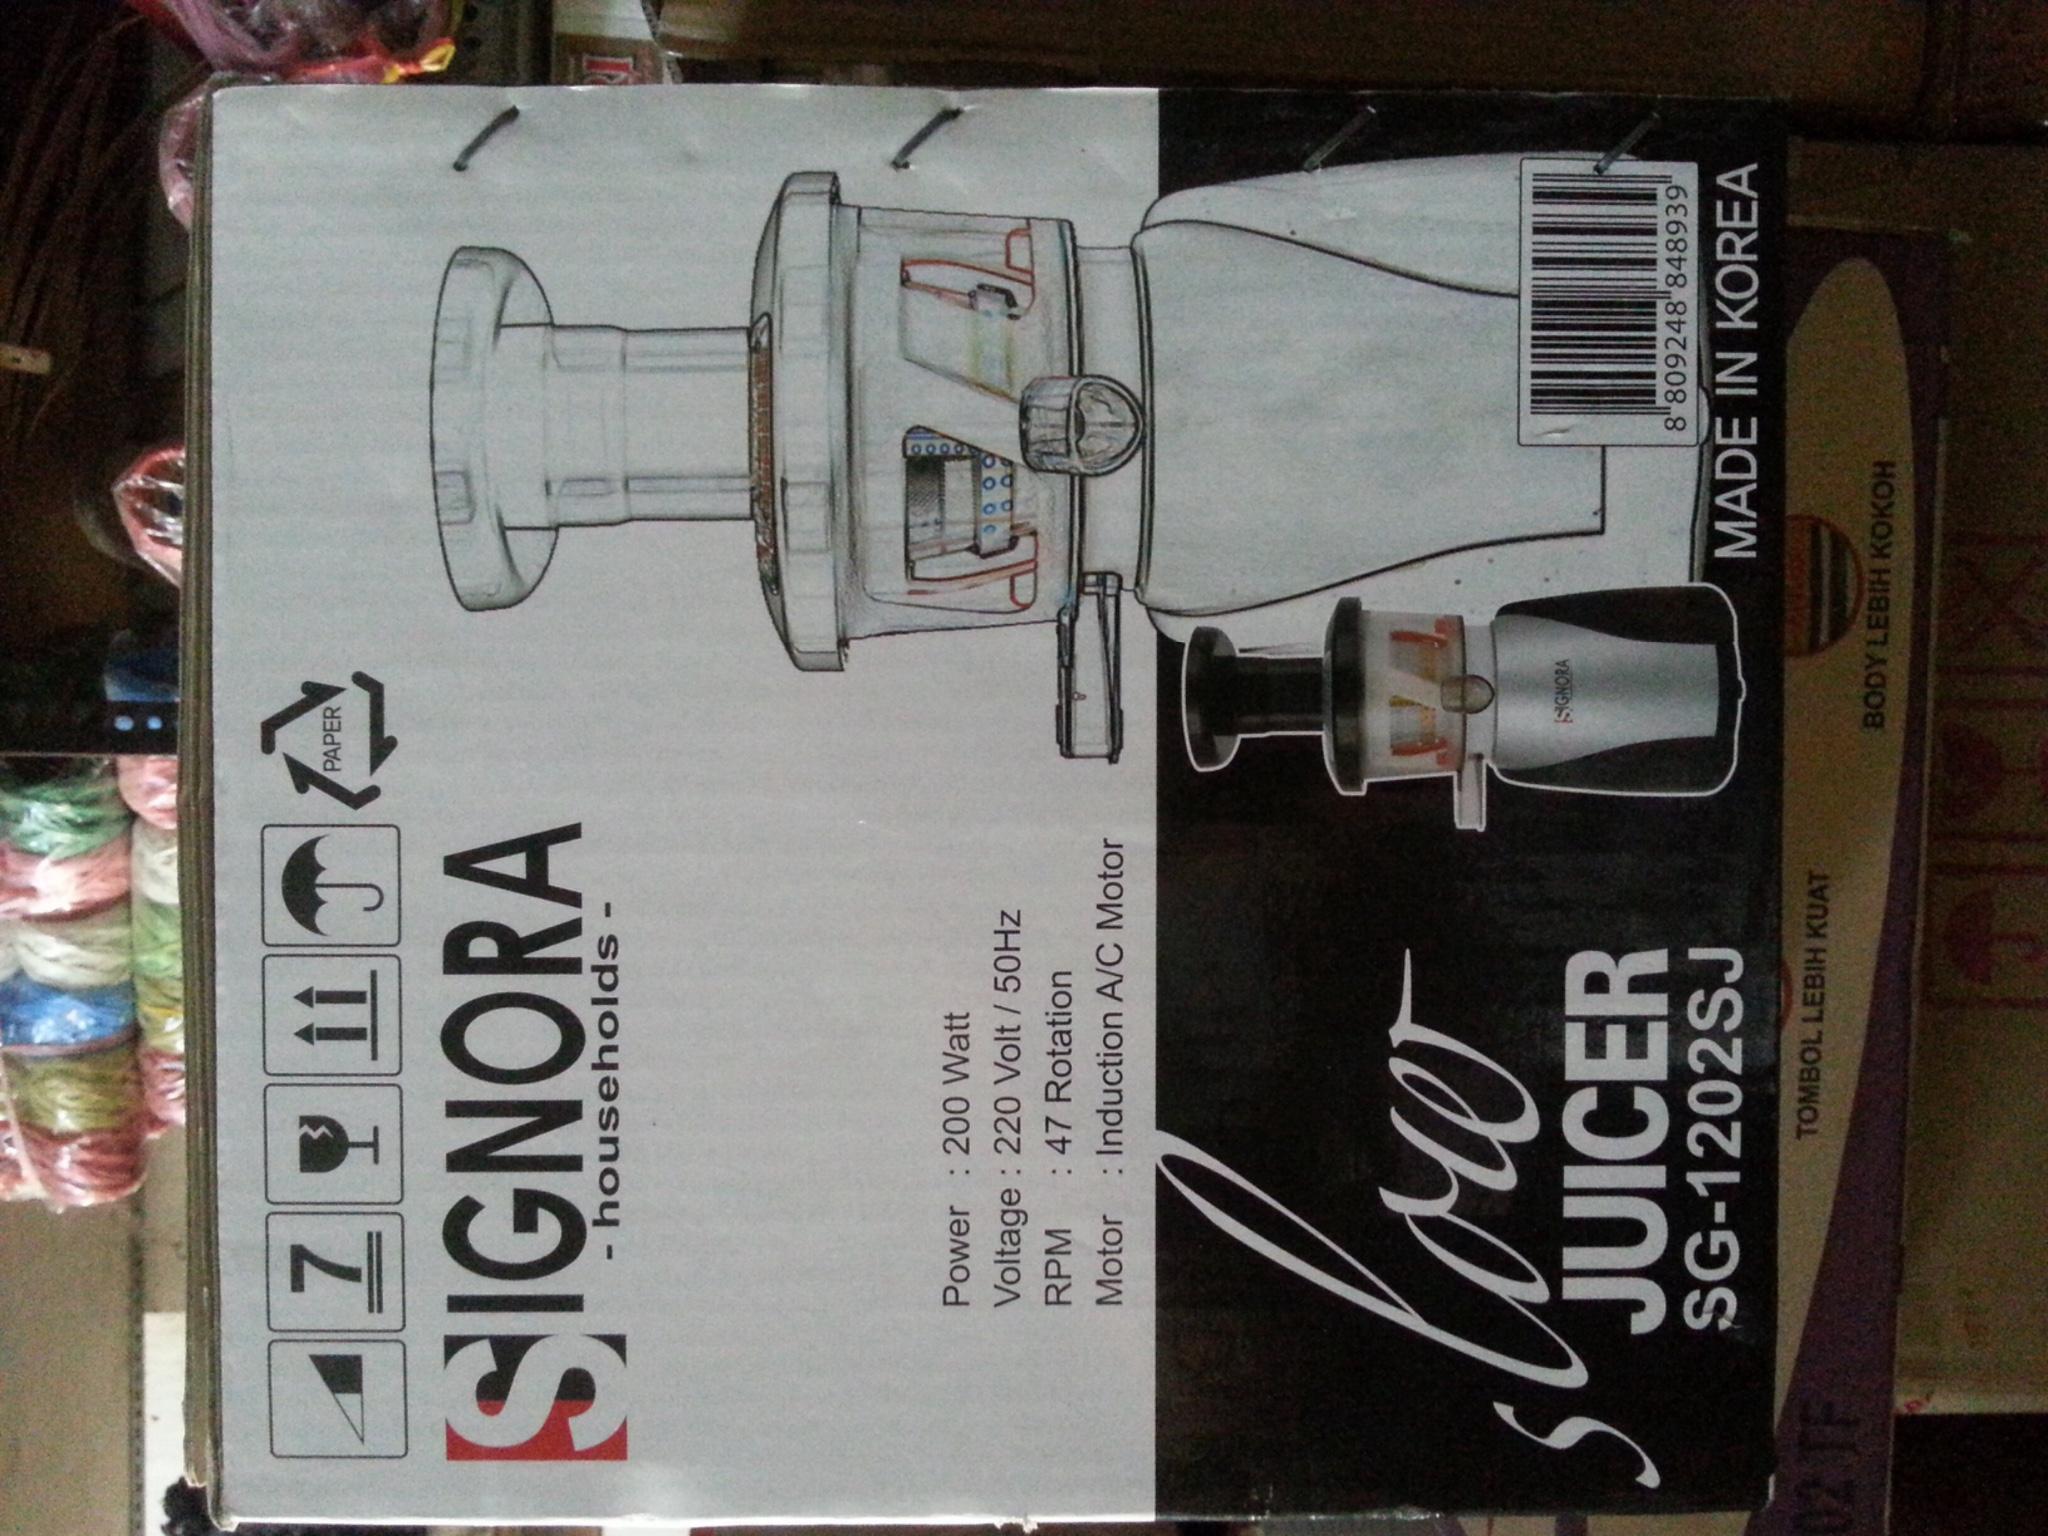 Mini Slow Juicer Signora : Jual Slow juicer signora SG-1202SJ bonus 30 cm pan signora - prima sport Tokopedia